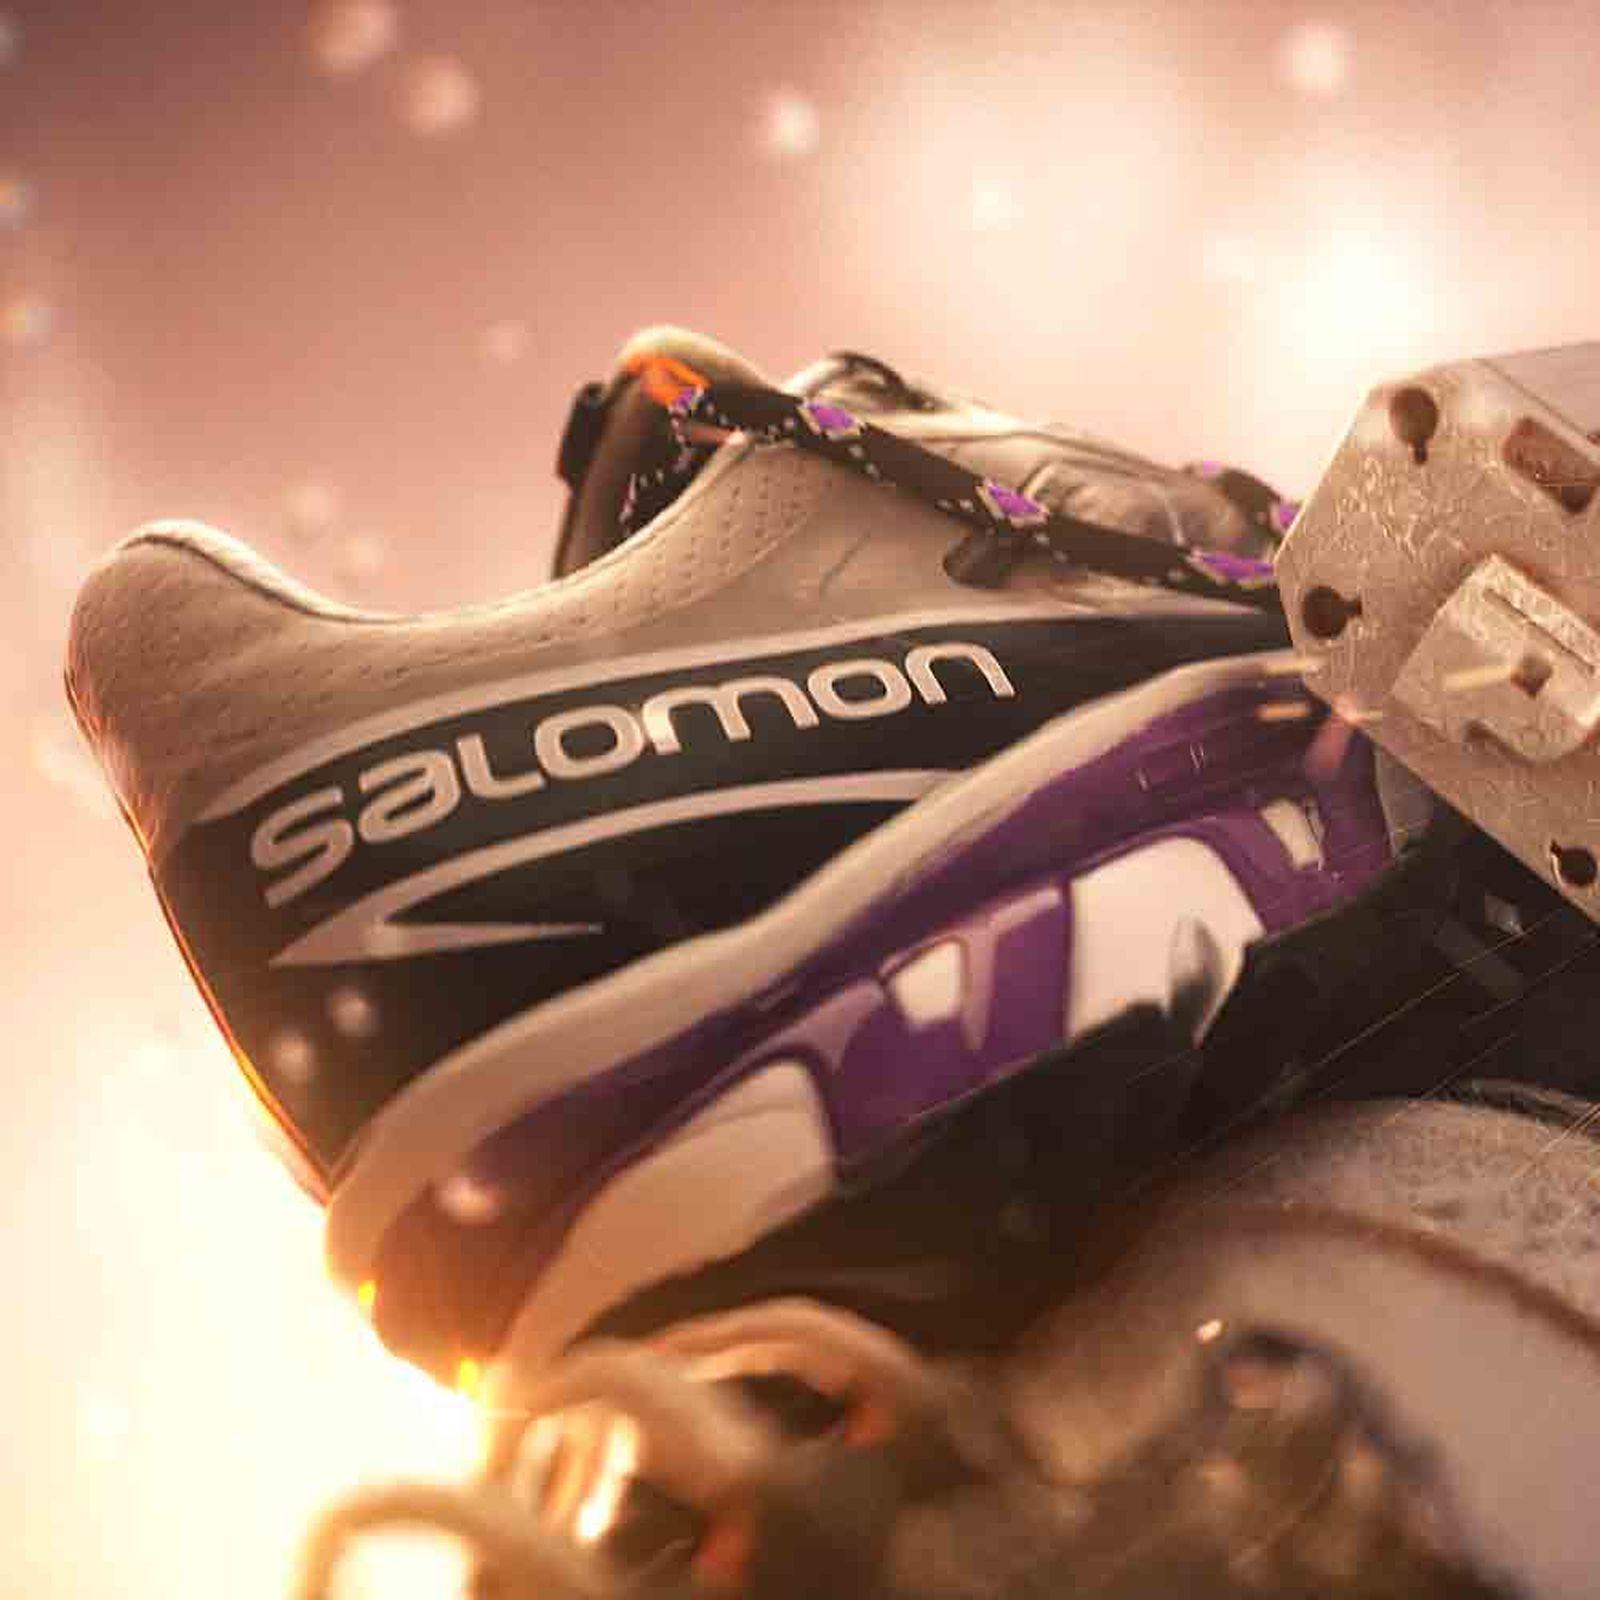 salomon-xt-6-ft-release-date-price-02